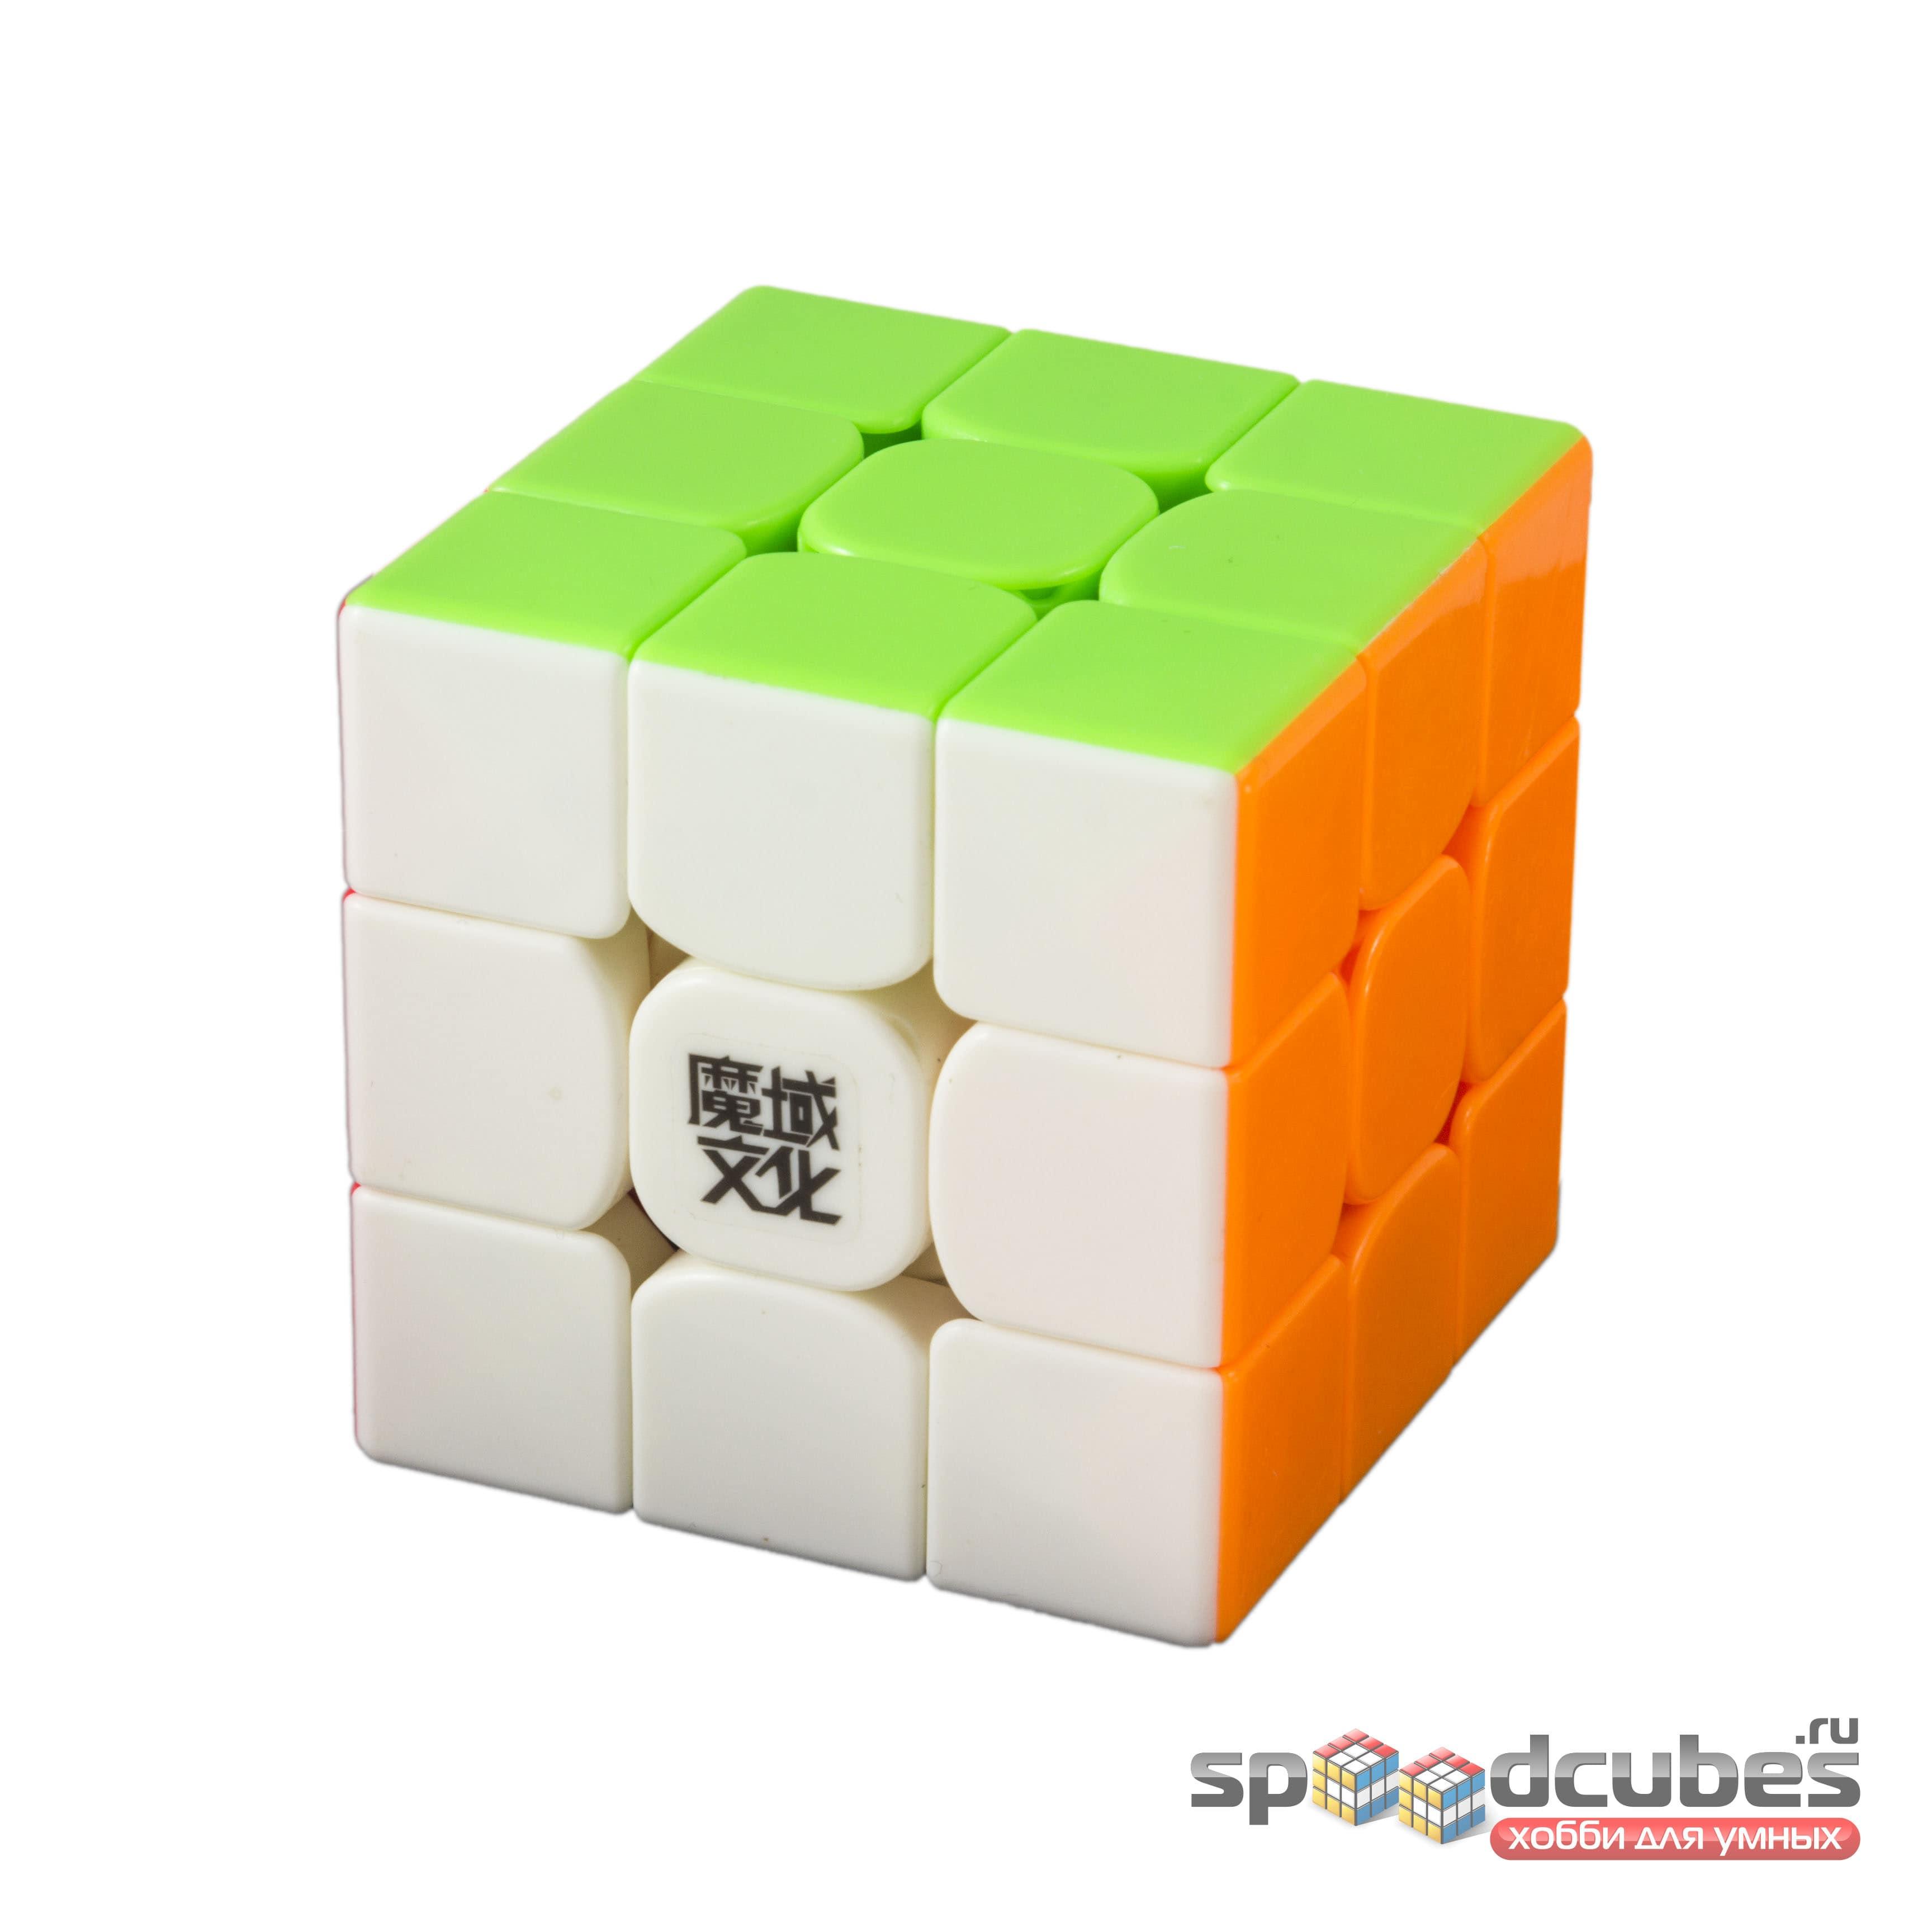 Moyu 3x3x3 Weilong Gts V2 M  Color 1